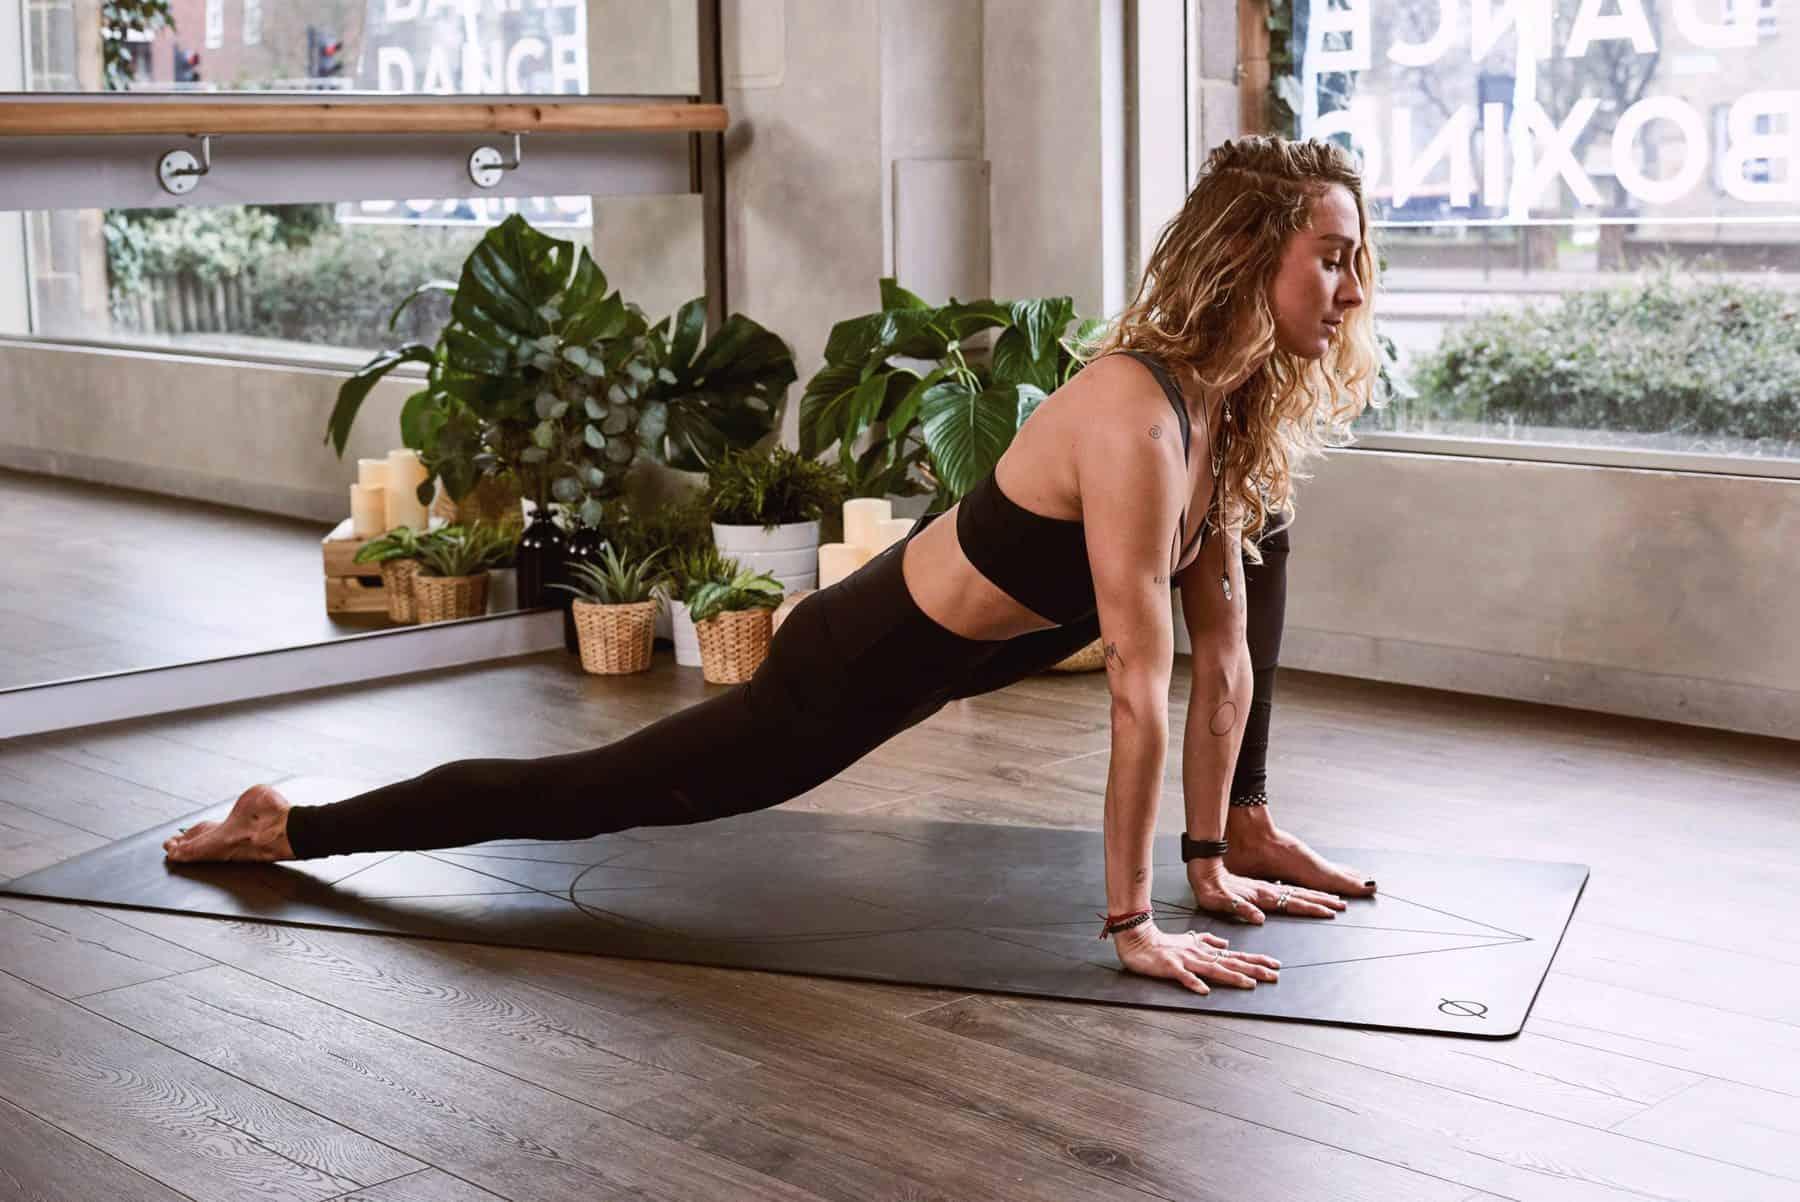 Turn Your Garden Room Into A Relaxing Outdoor Home Yoga Studio